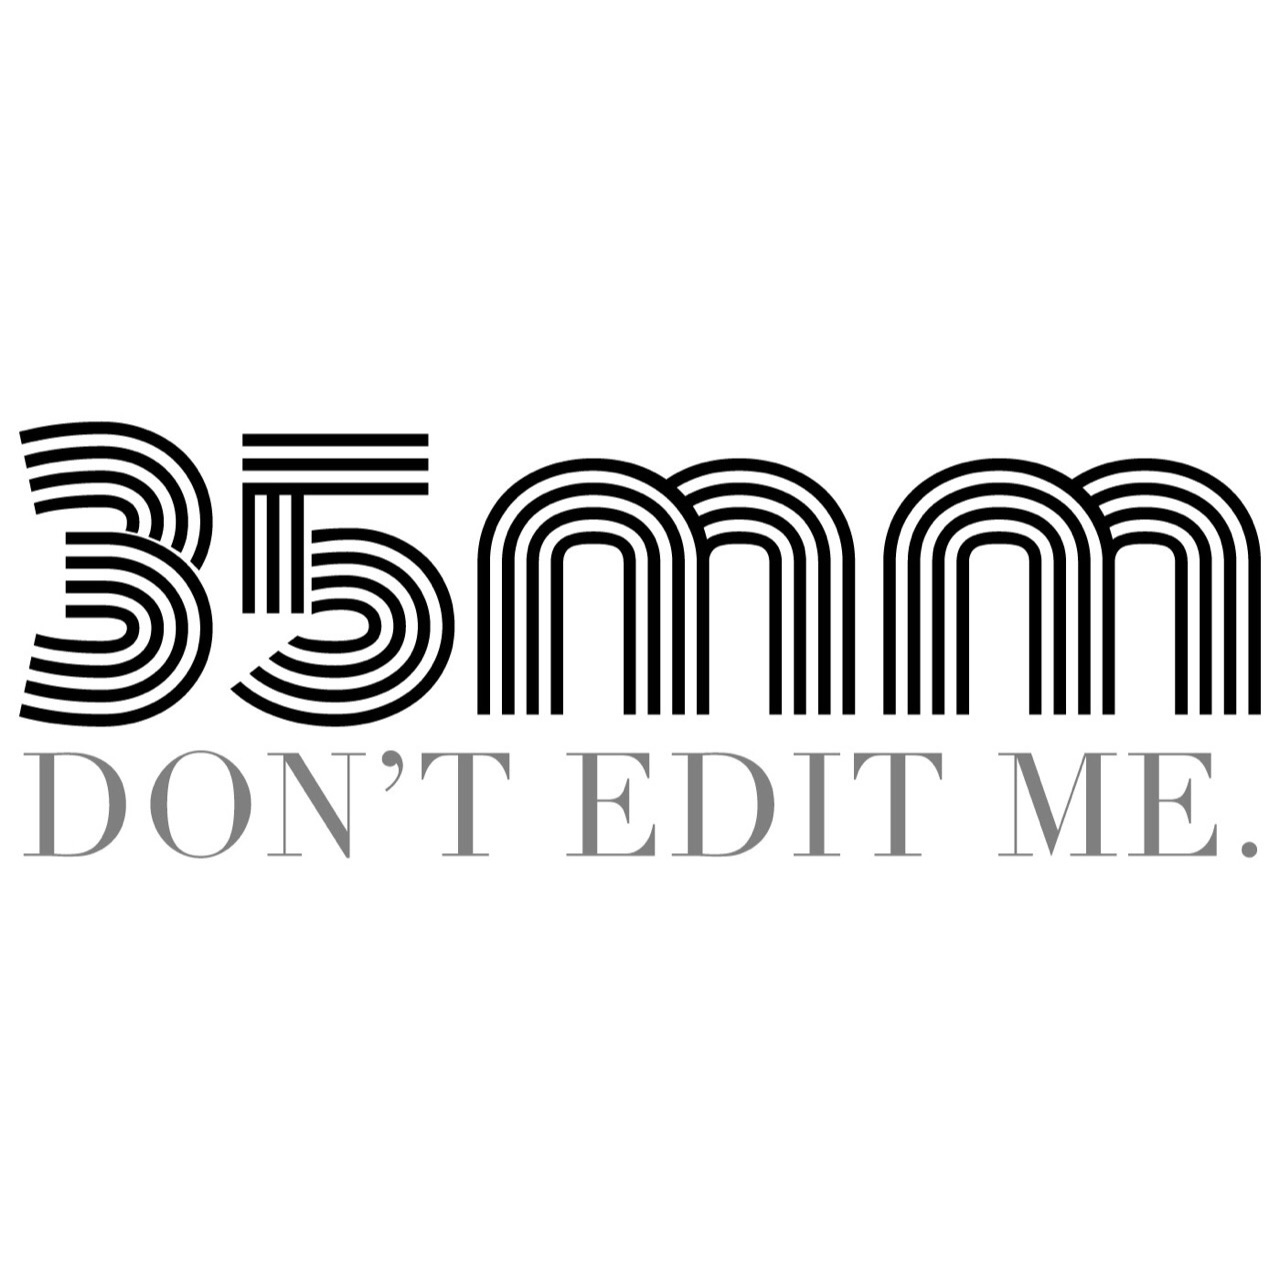 35mm logo.jpg